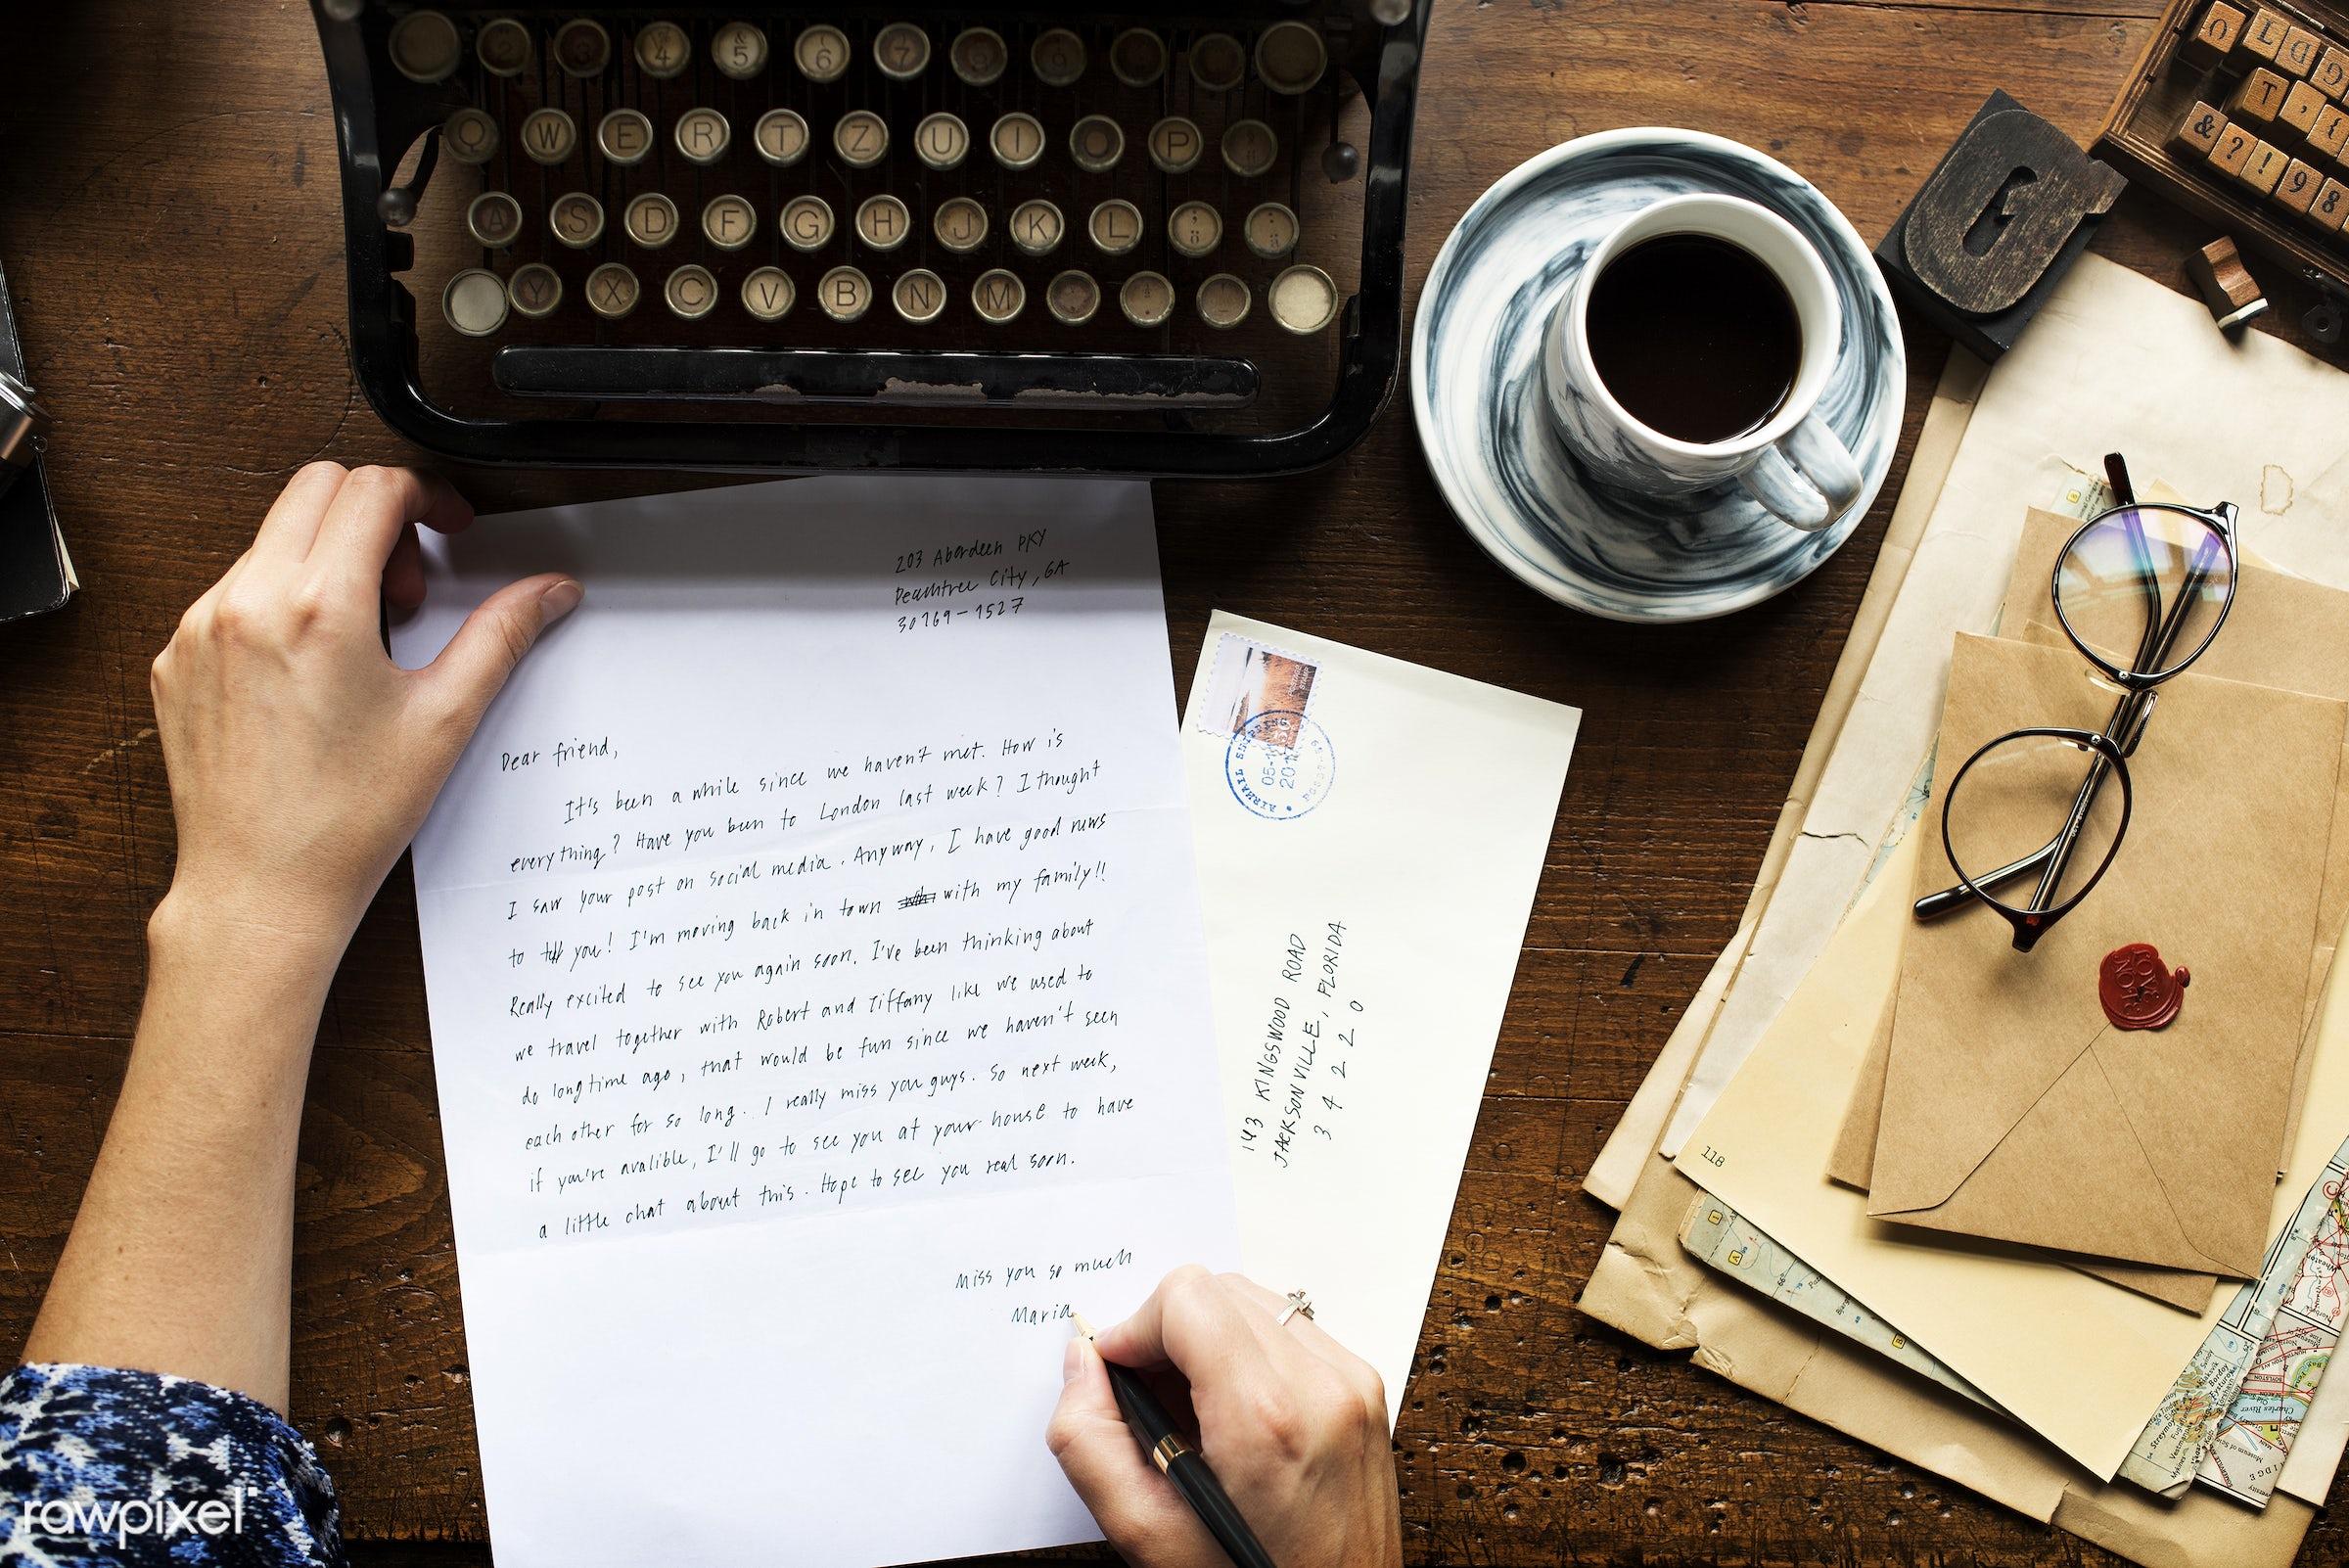 plant, workspace, paper, envelope, wax, retro, writing, workplace, drinks, hands, seal, typewriter, working, aerial view,...